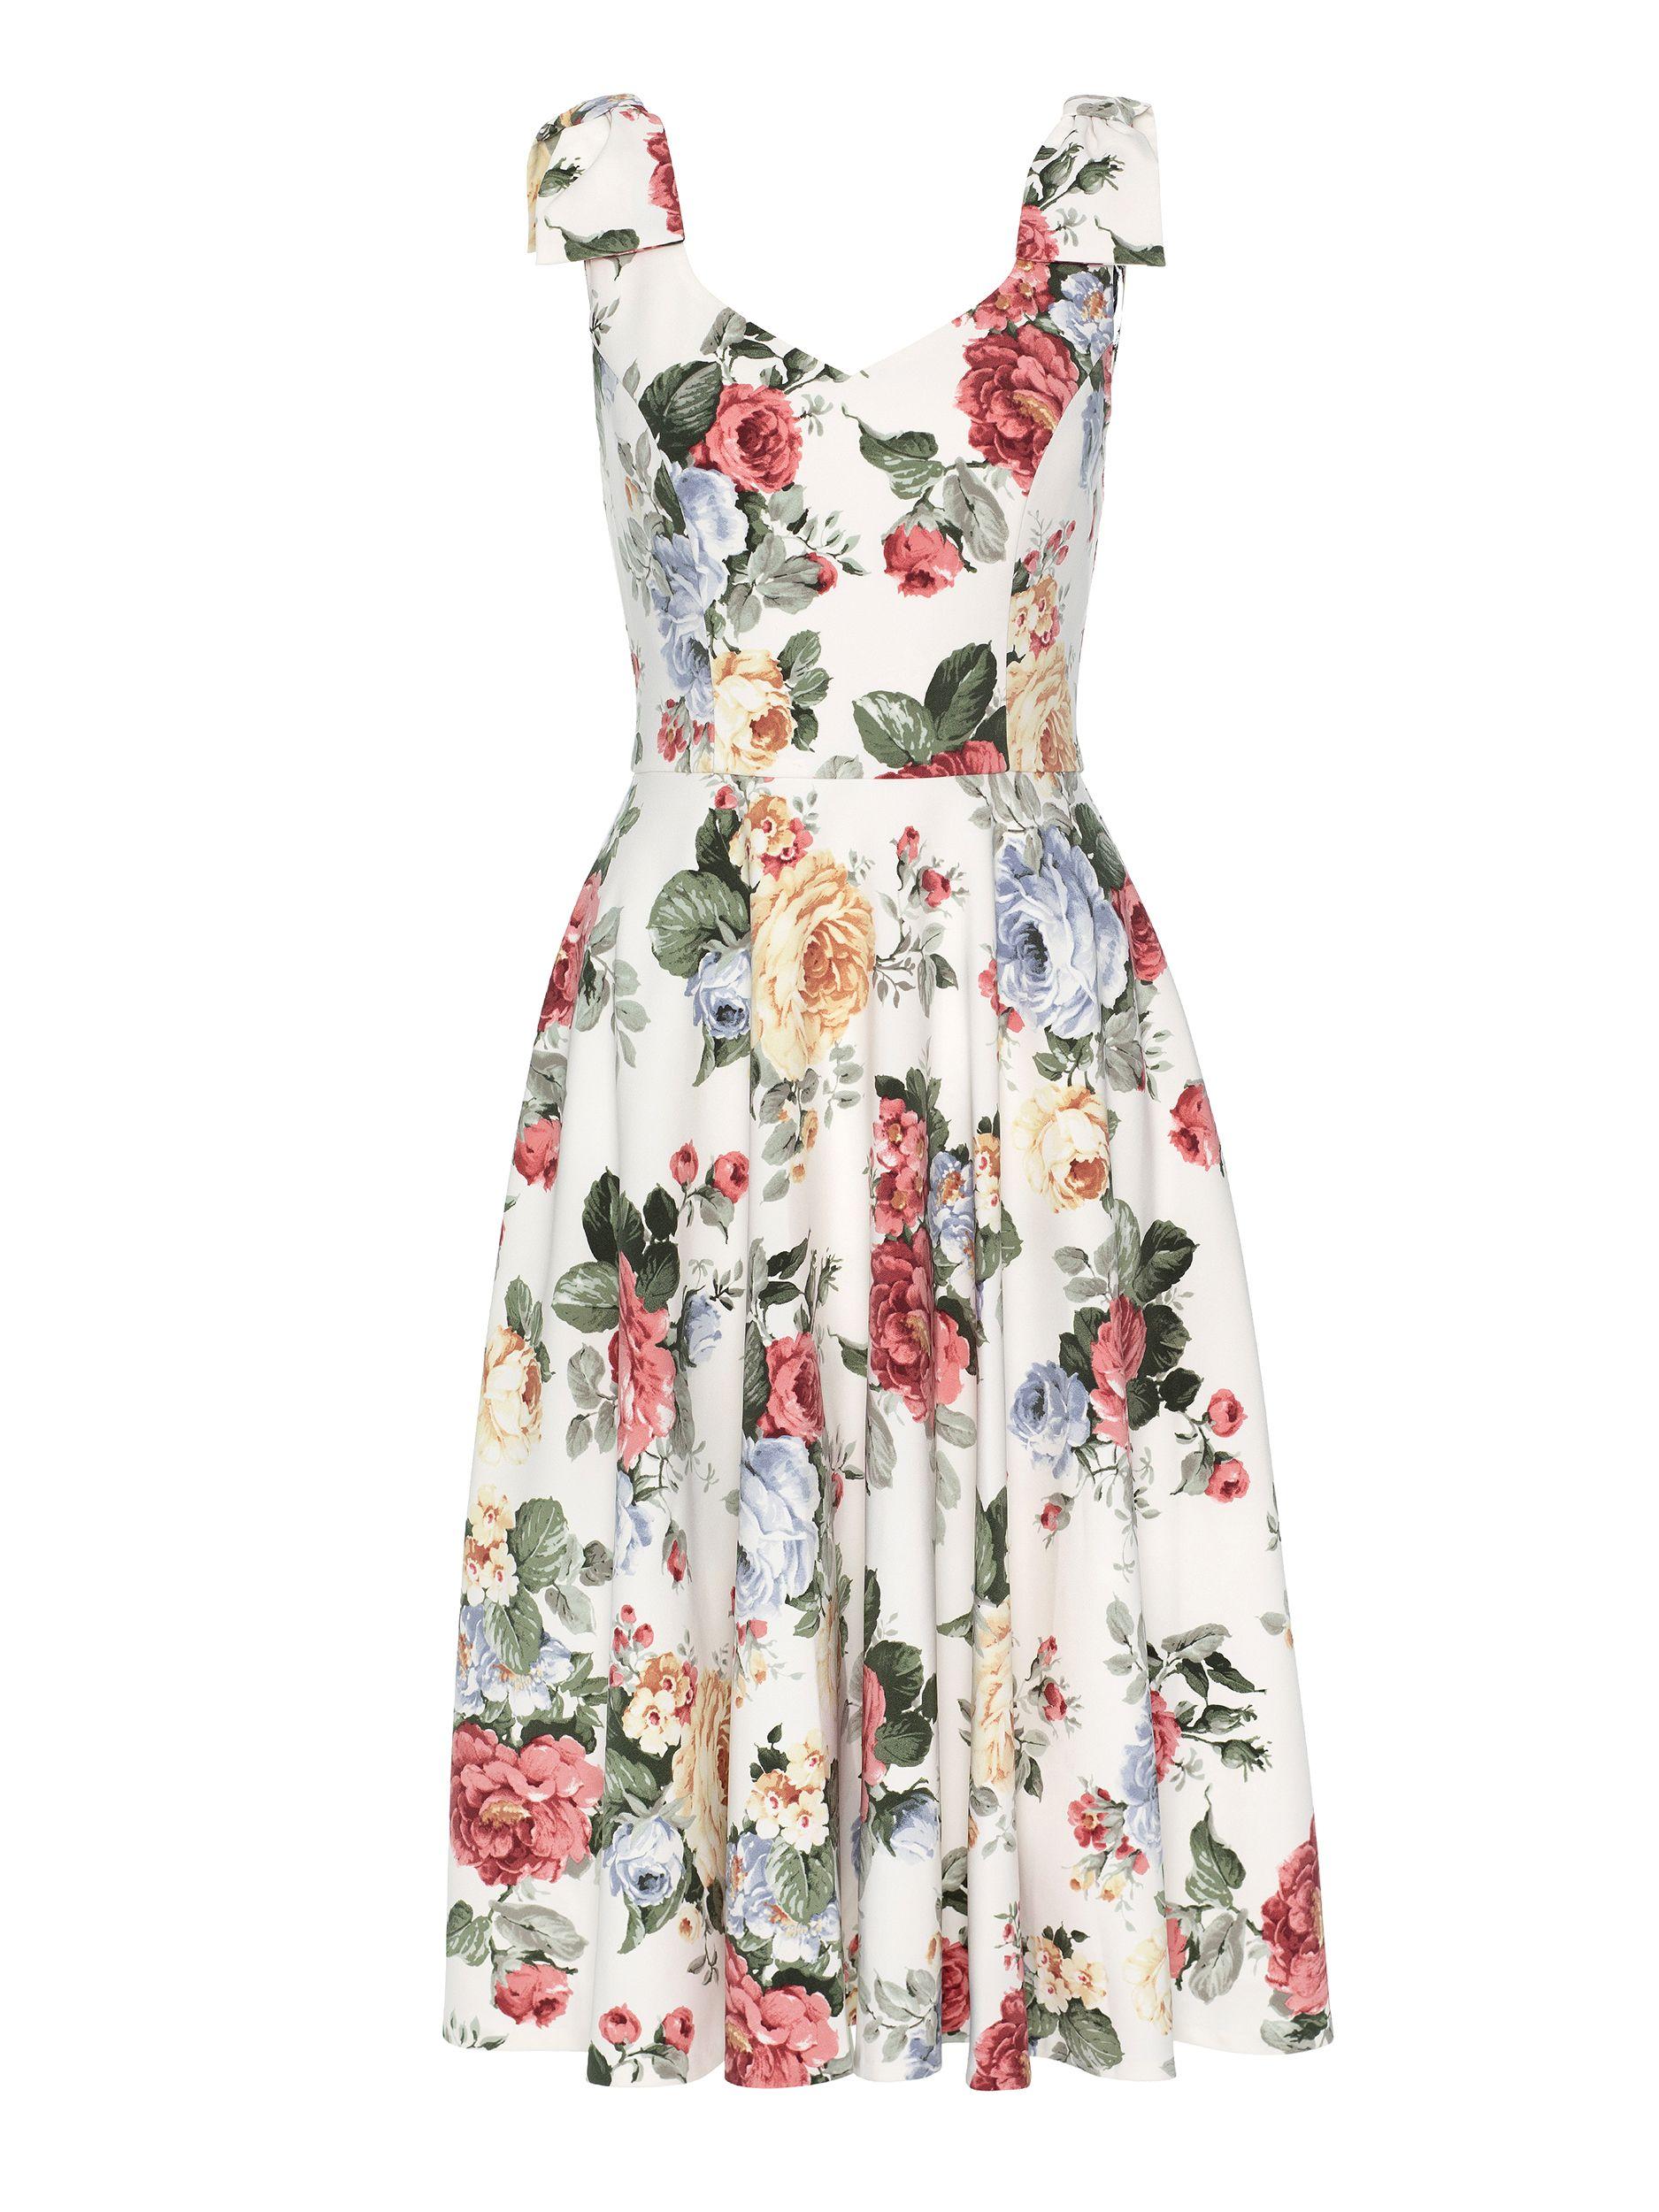 Love Affair Dress Review Australia Vintage Summer Dresses Sleeveless Dress Outfit Dresses